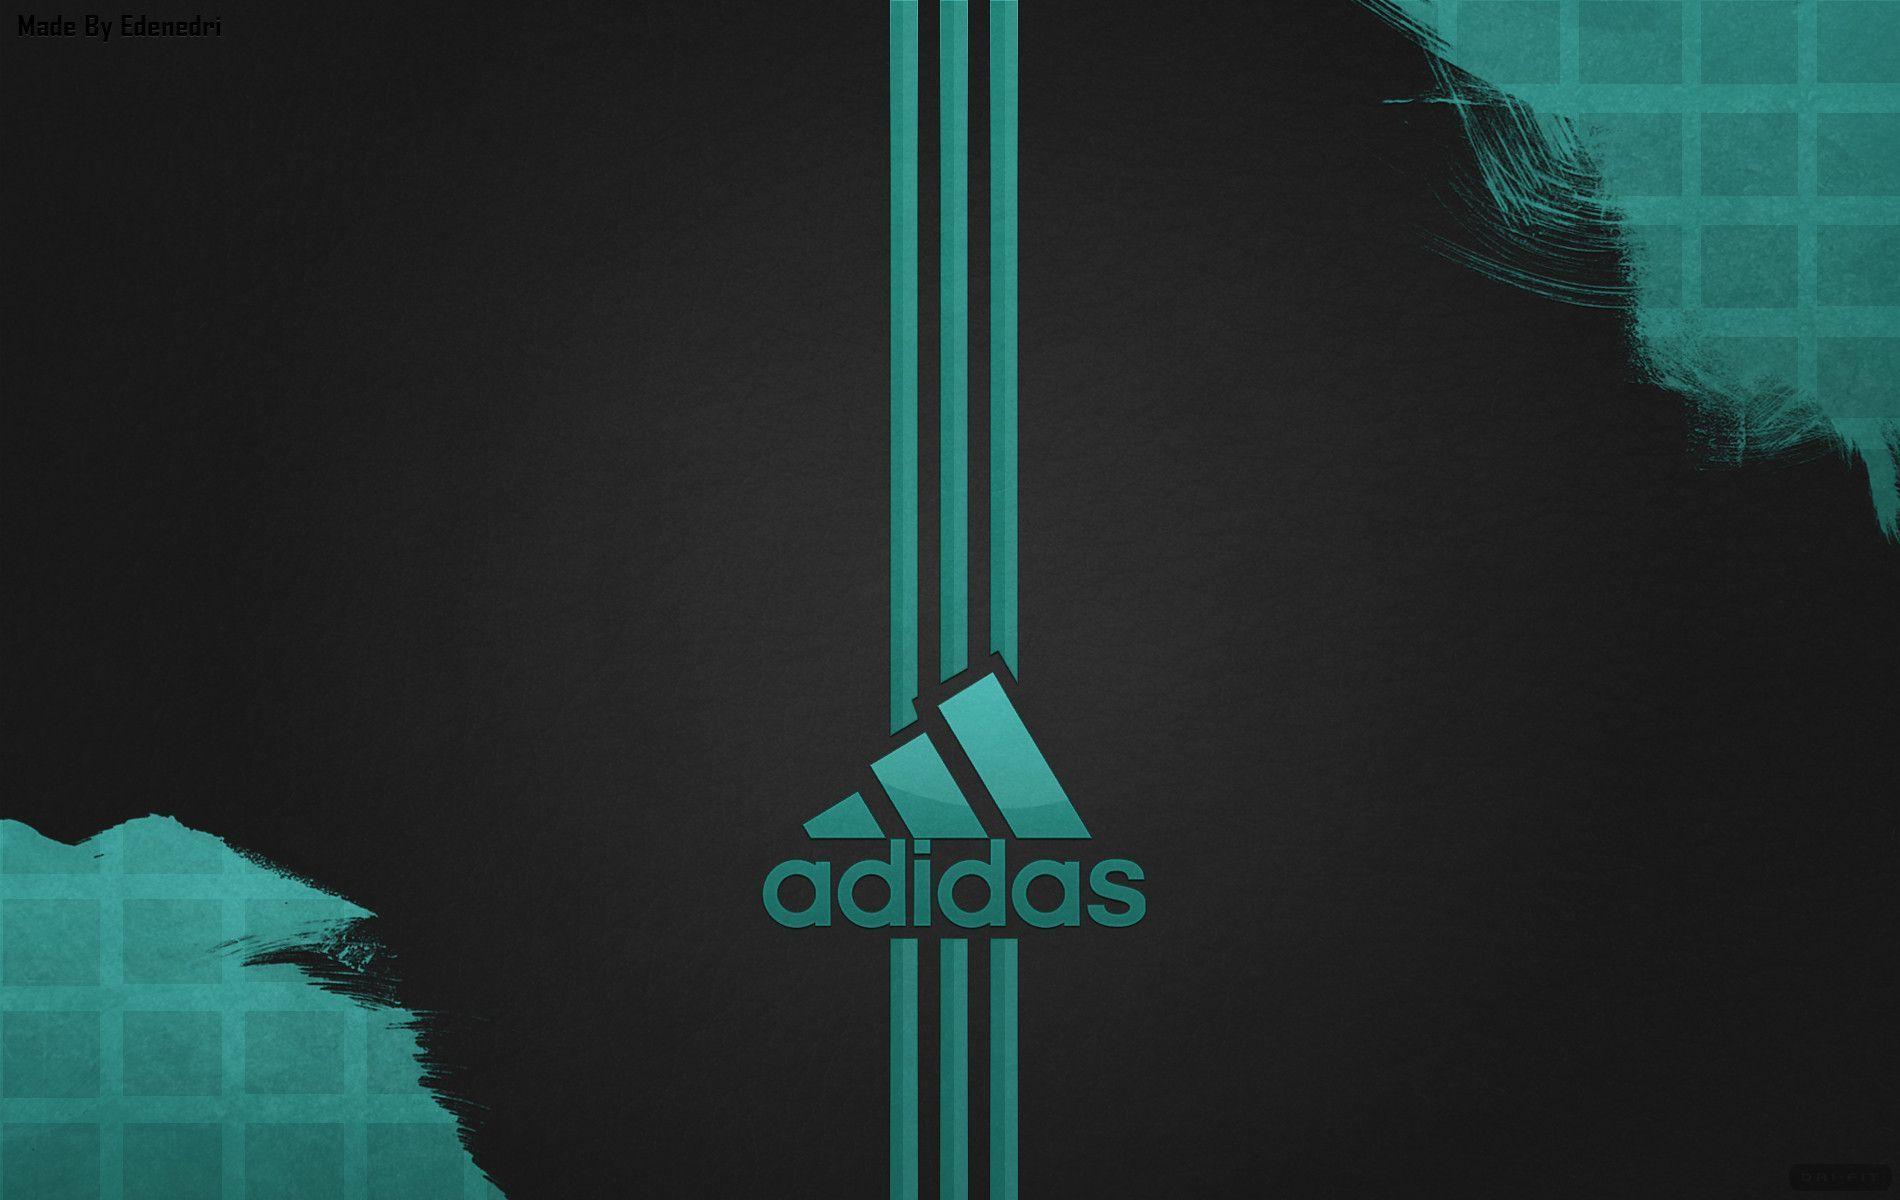 Adidas Glow Free HD Widescreen Wallpapers 6591 #9037 Wallpaper ...